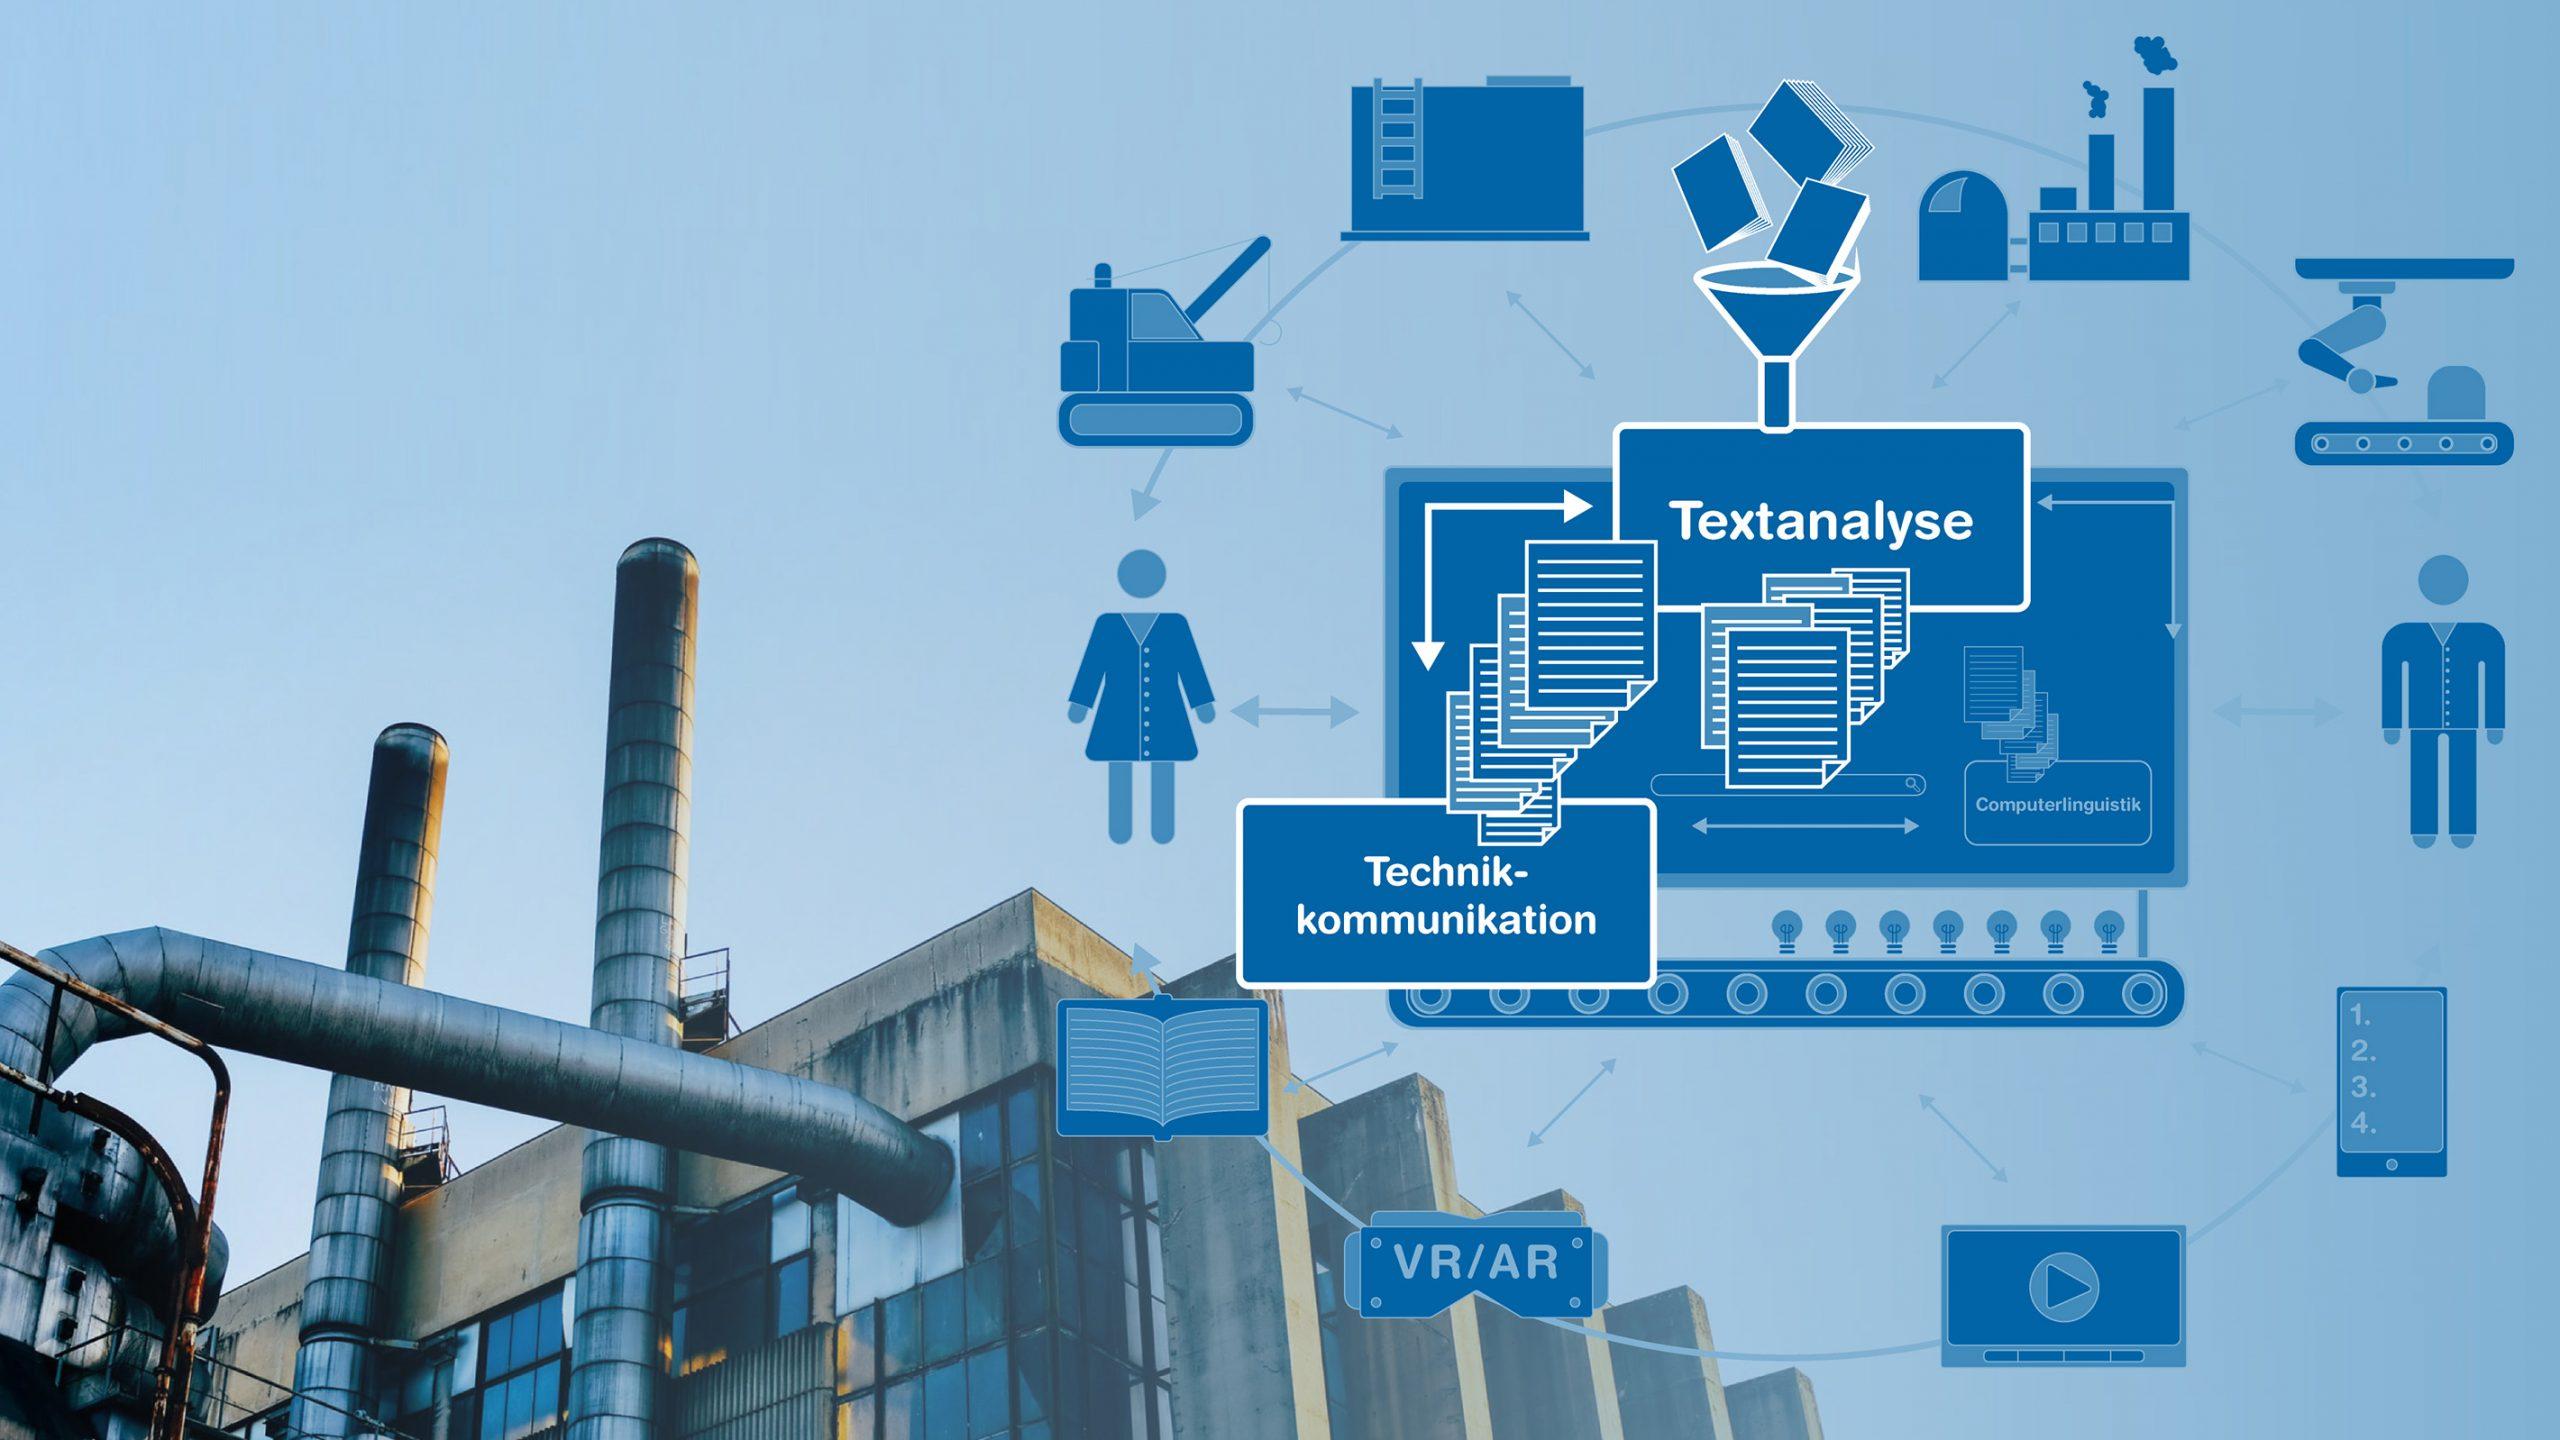 technische-dokumentation-textanalyse-blog-zhaw-iued